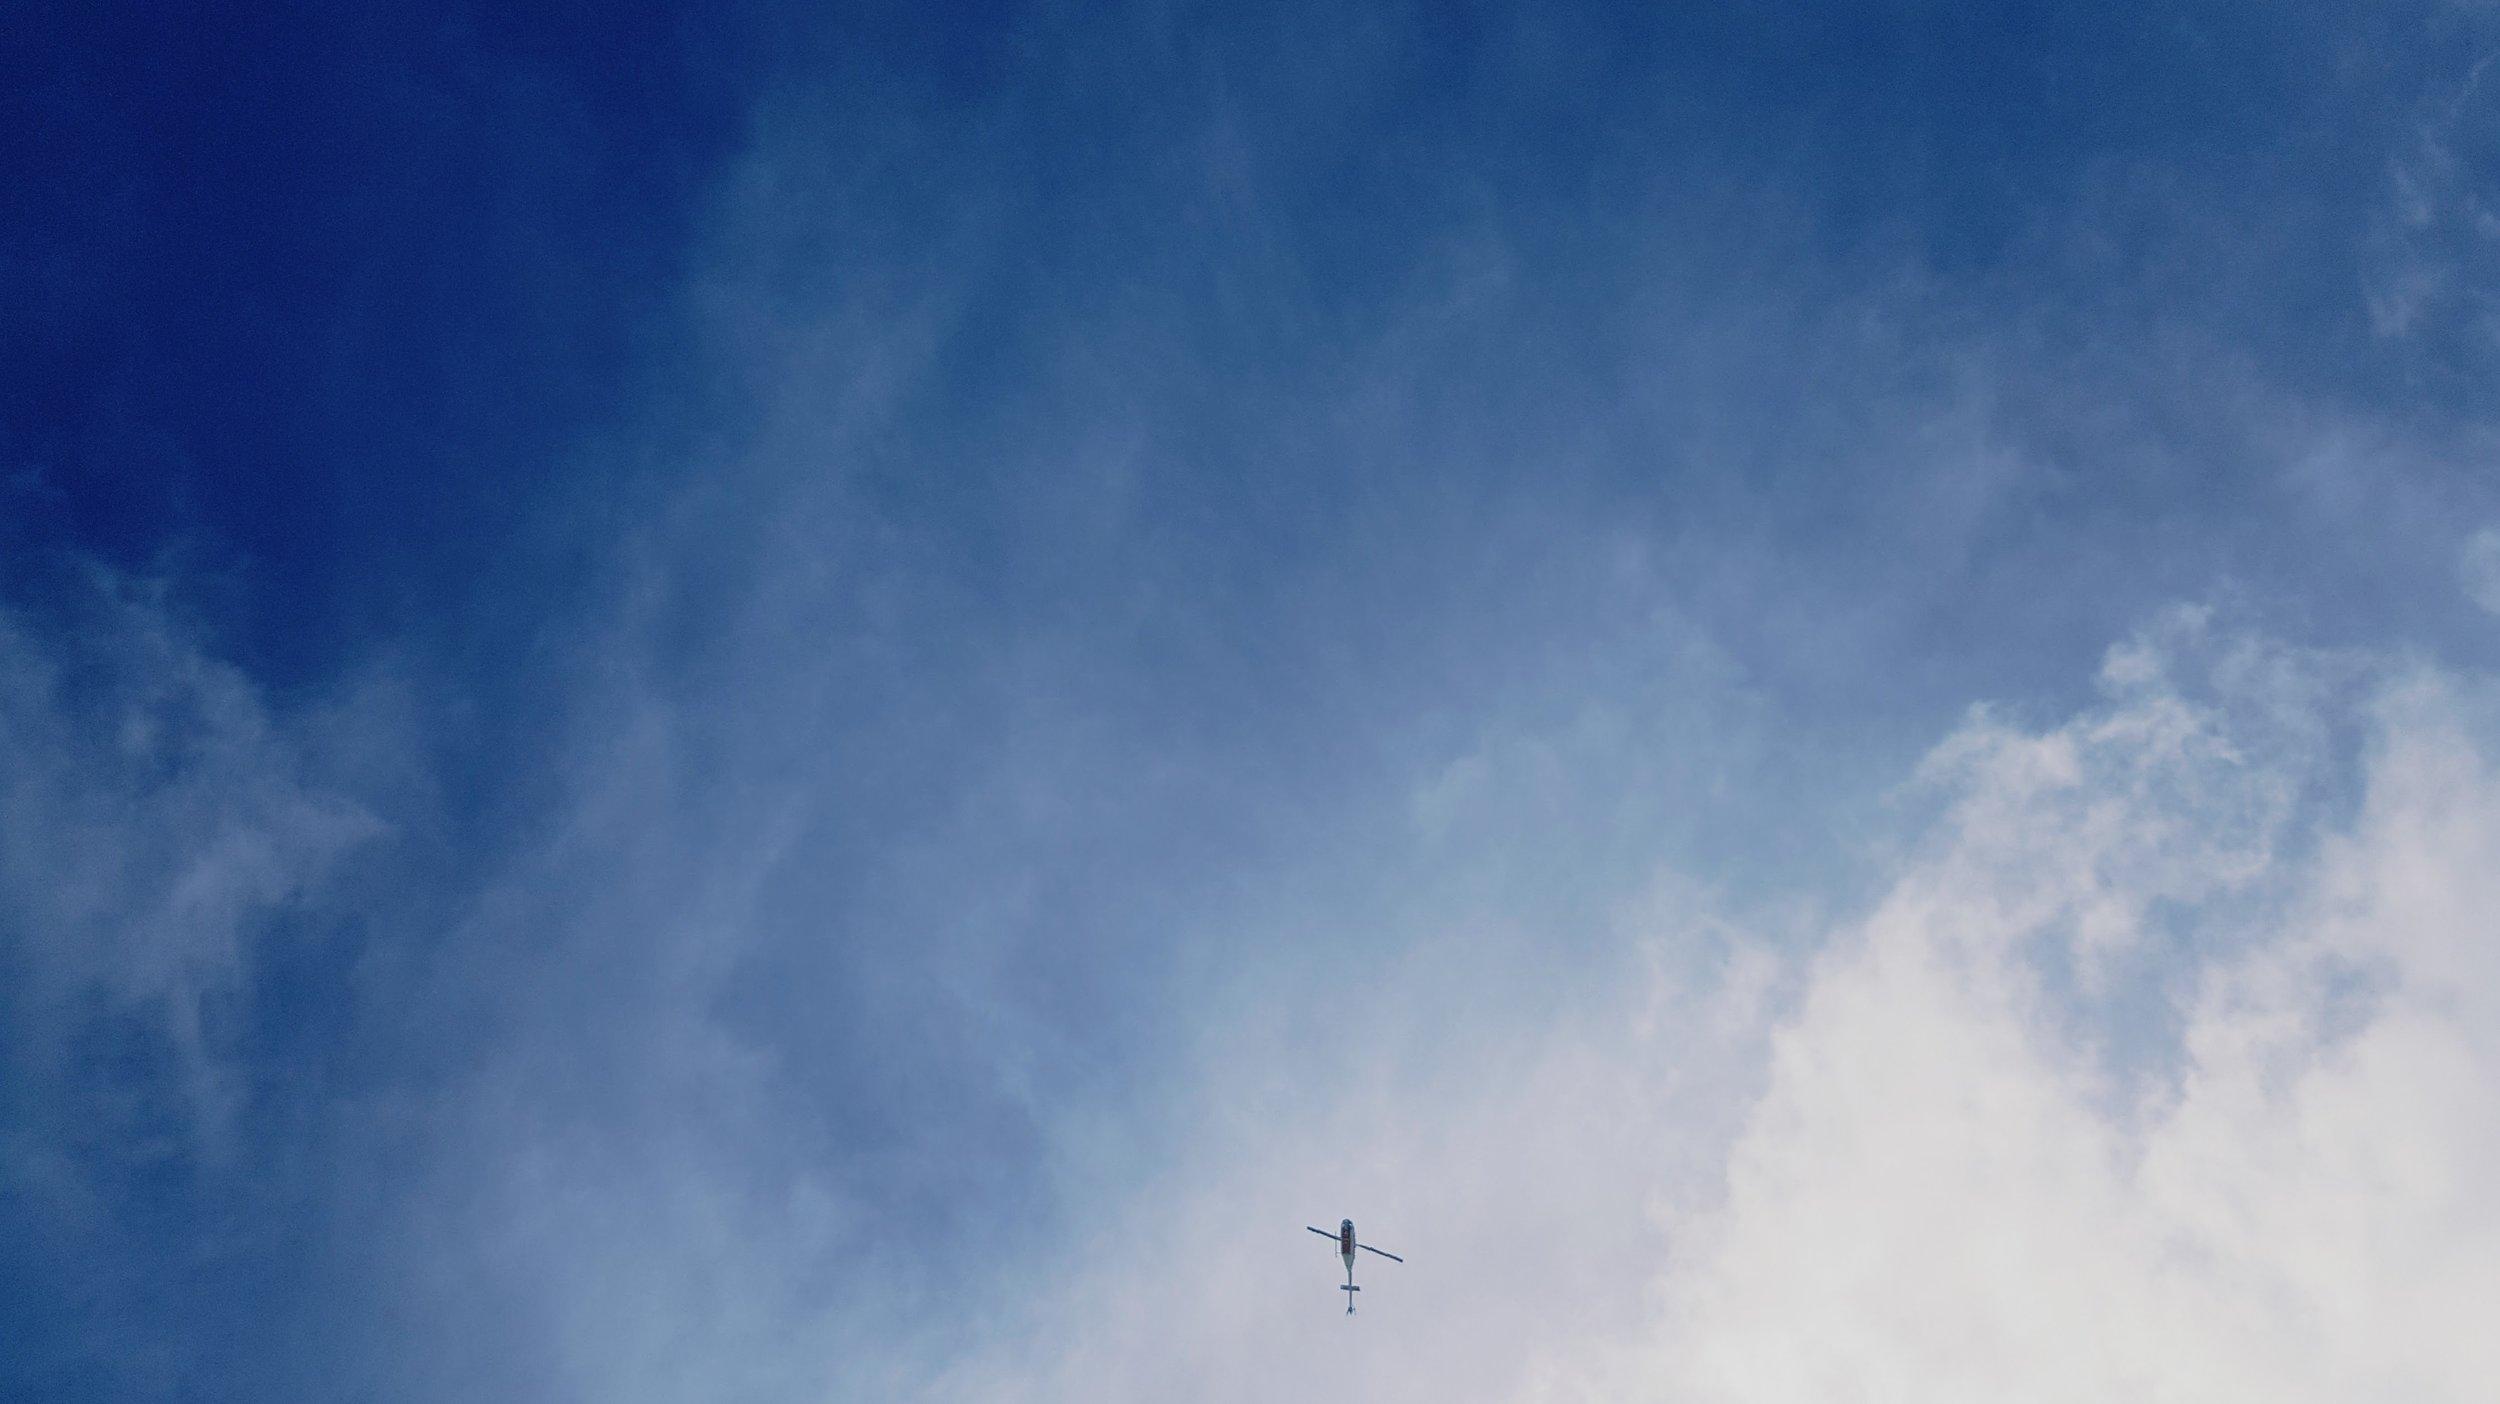 Matthew Albertell Photography Helicopter.jpg